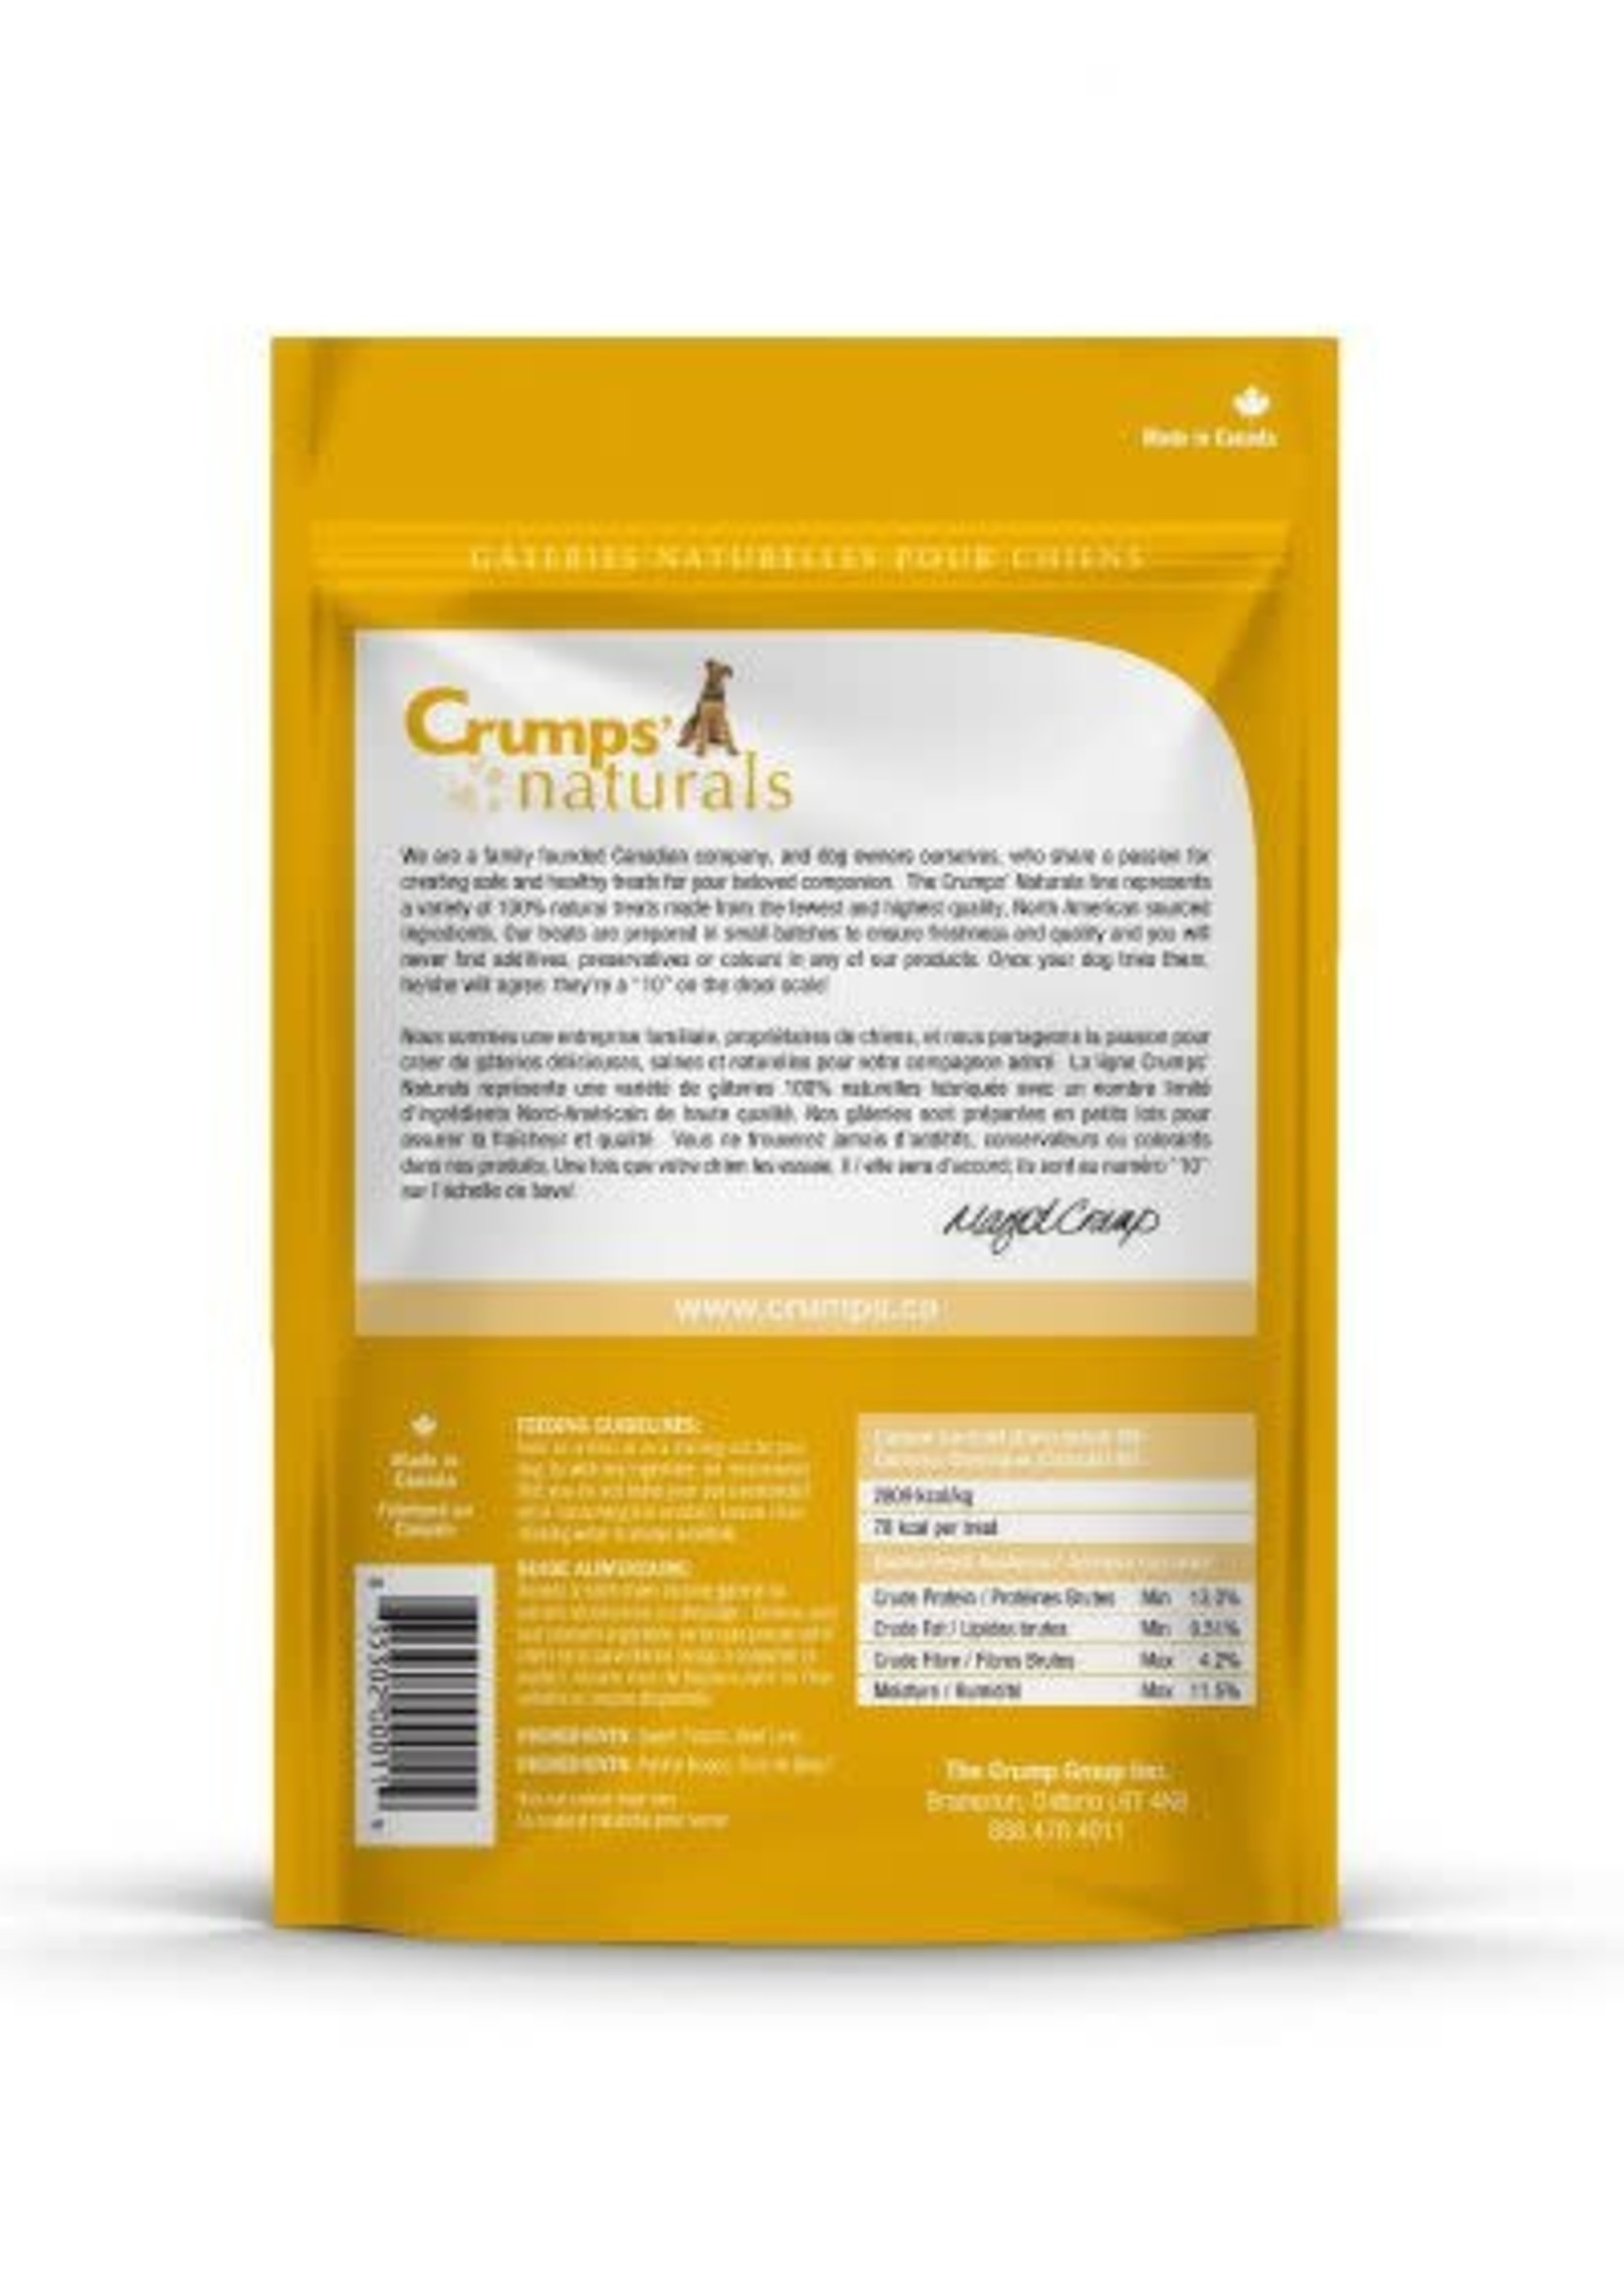 Crumps Sweet Potato & Liver 5.6oz